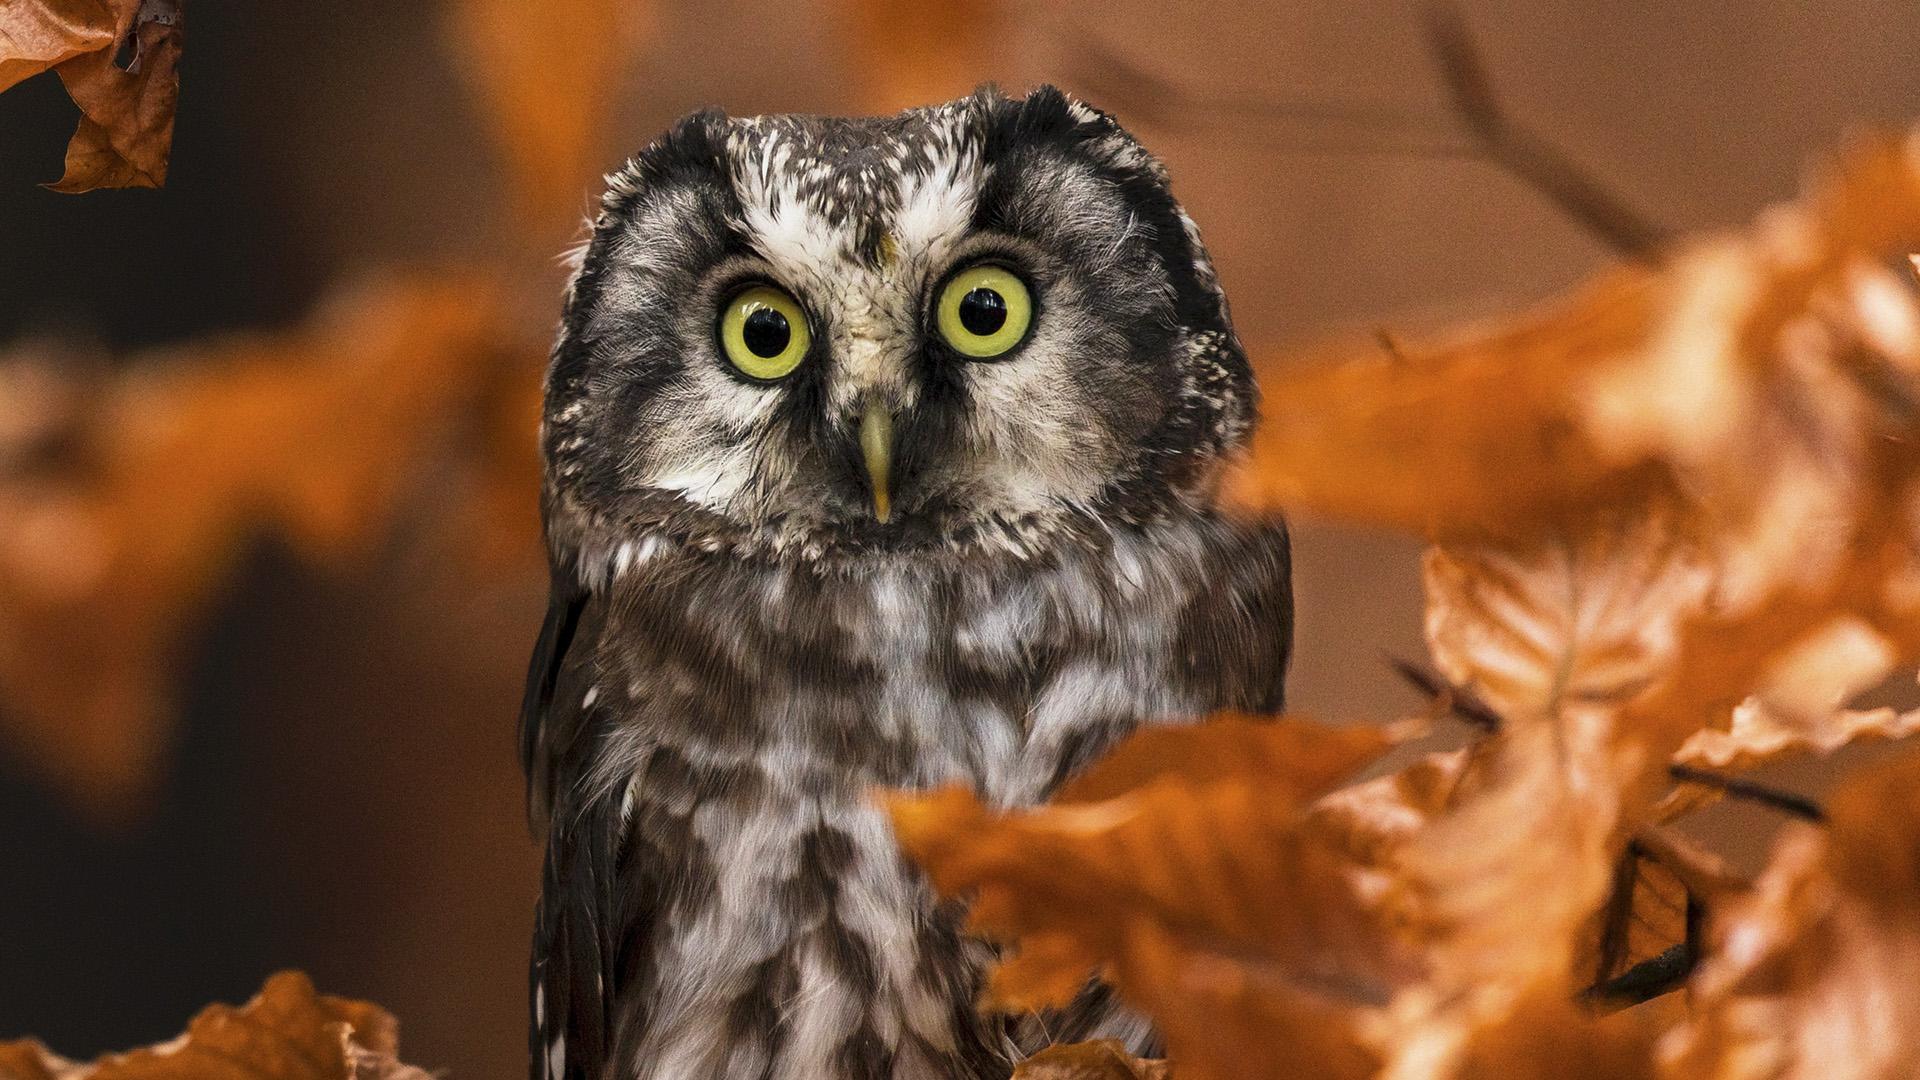 Eye Size Of Birds May Predict Sensitivity To Environmental Change: Study